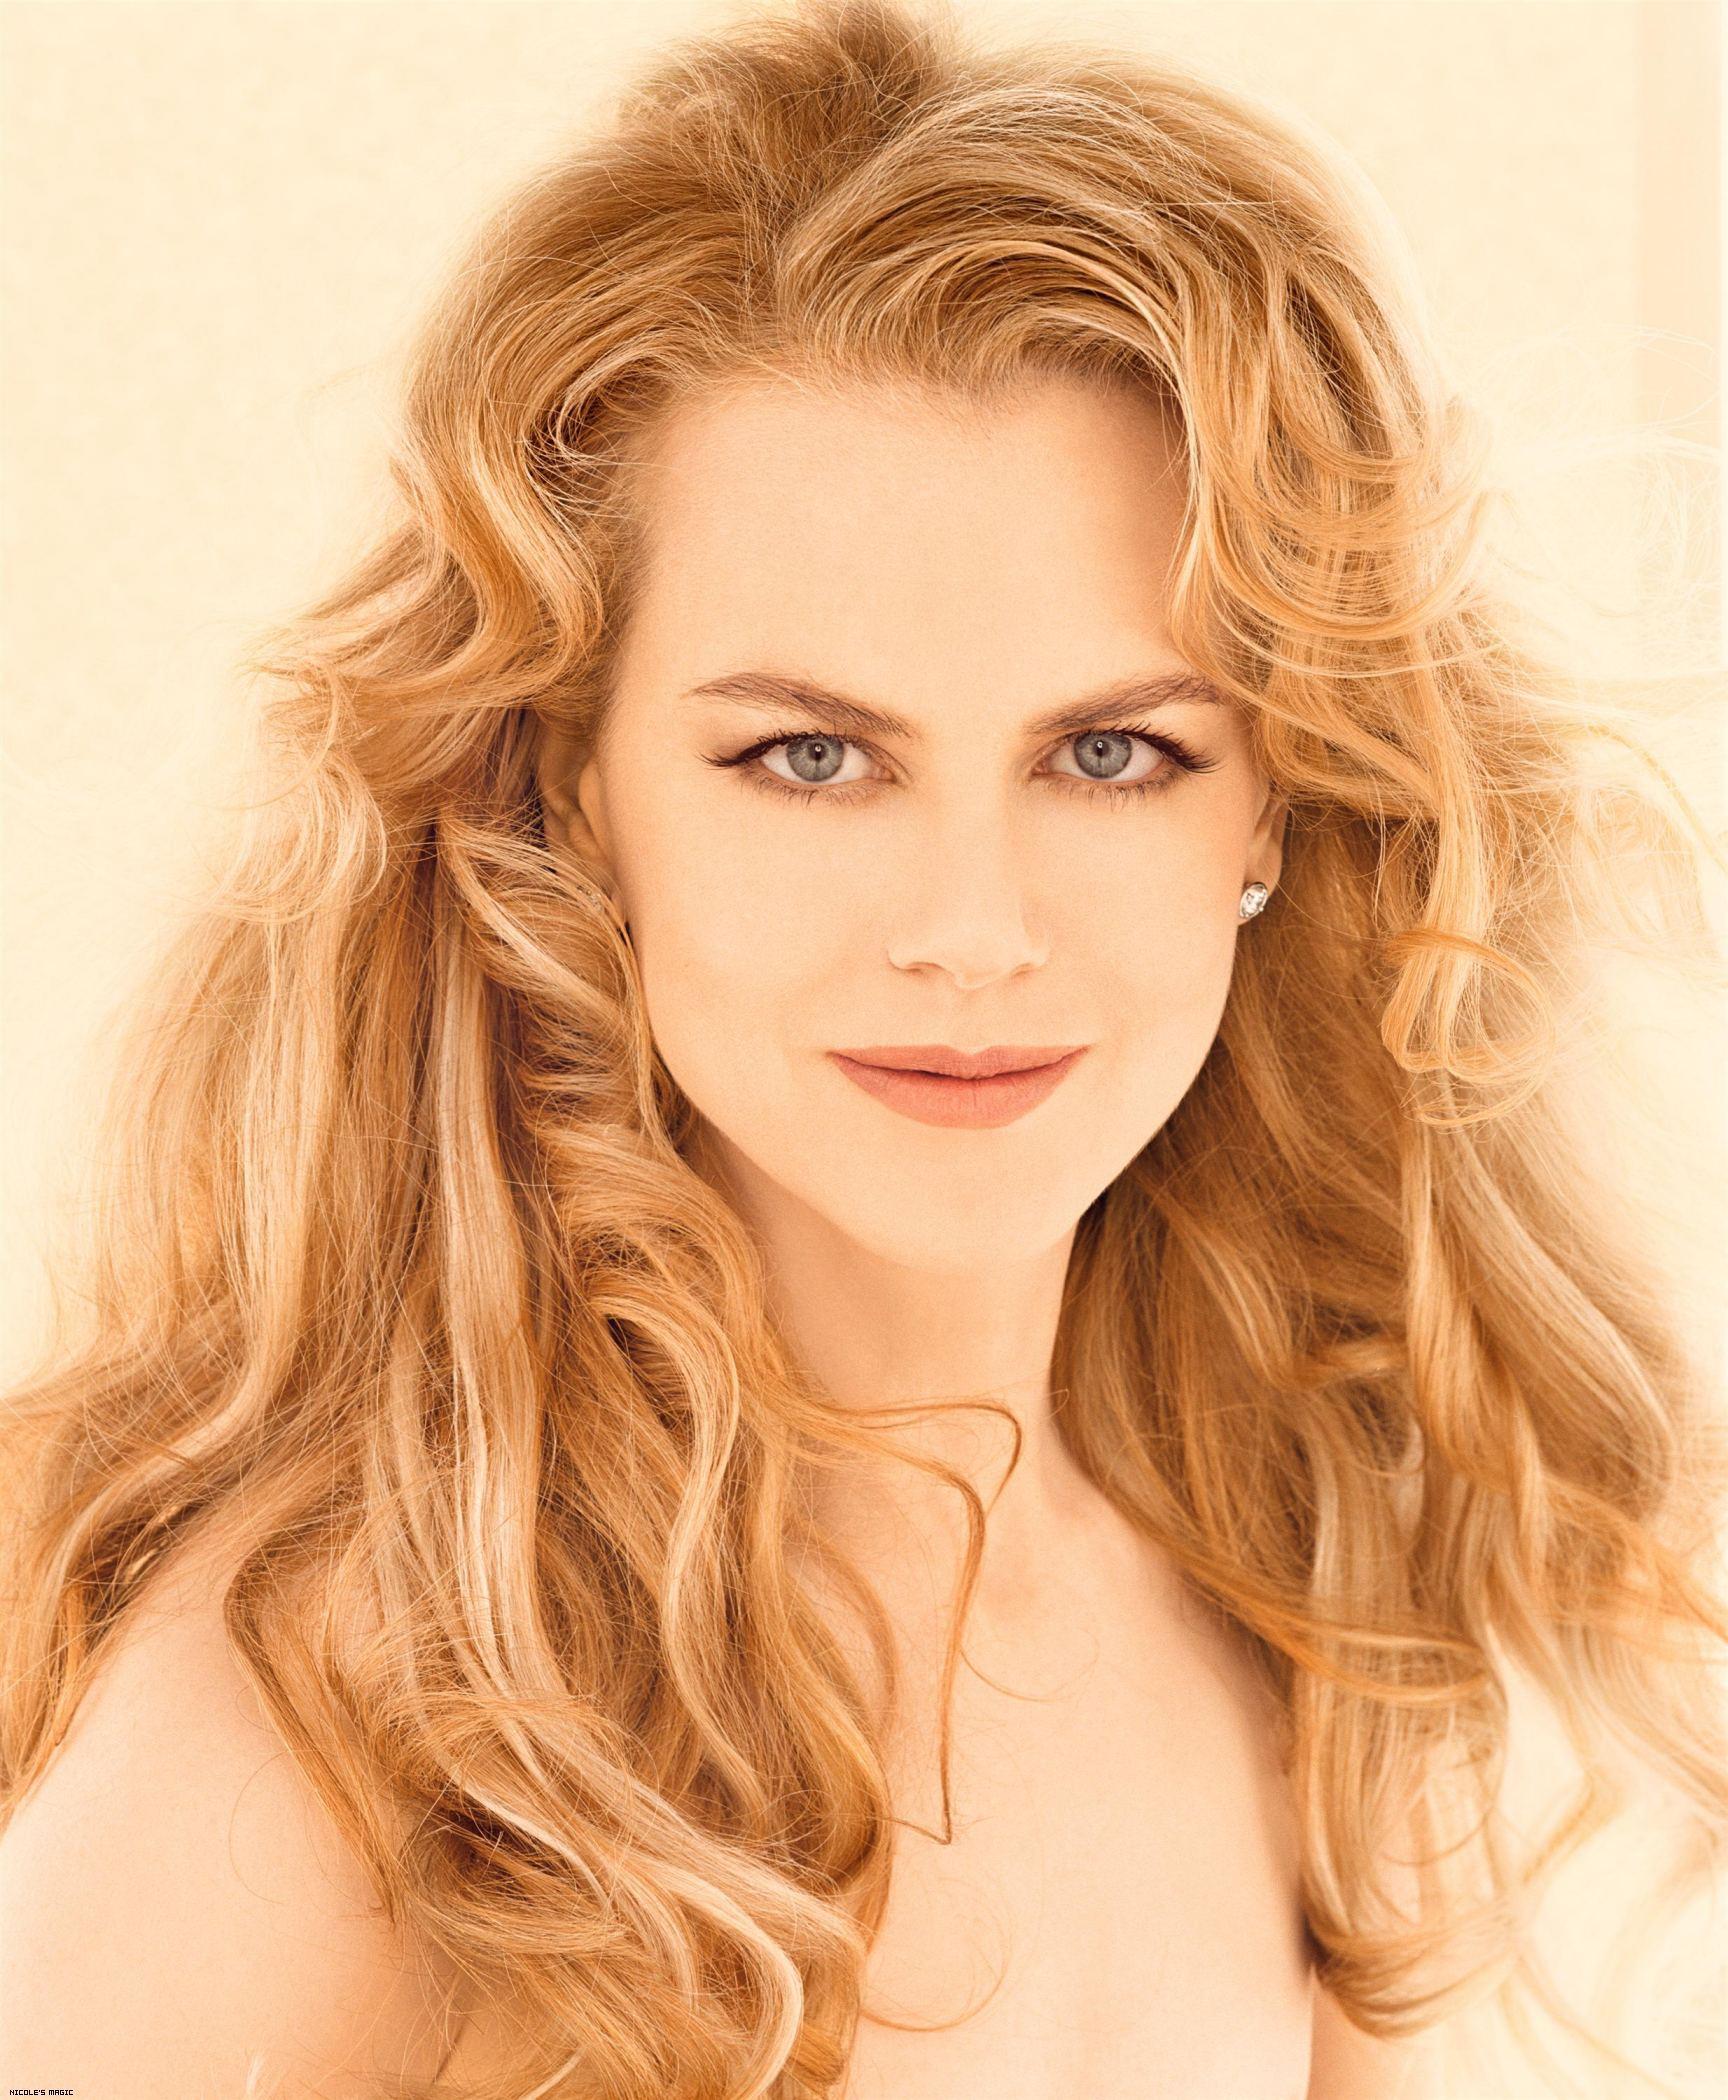 Nicole @ The 2011 Golden Globe Awards - Nicole Kidman picha (18551417) - fanpop